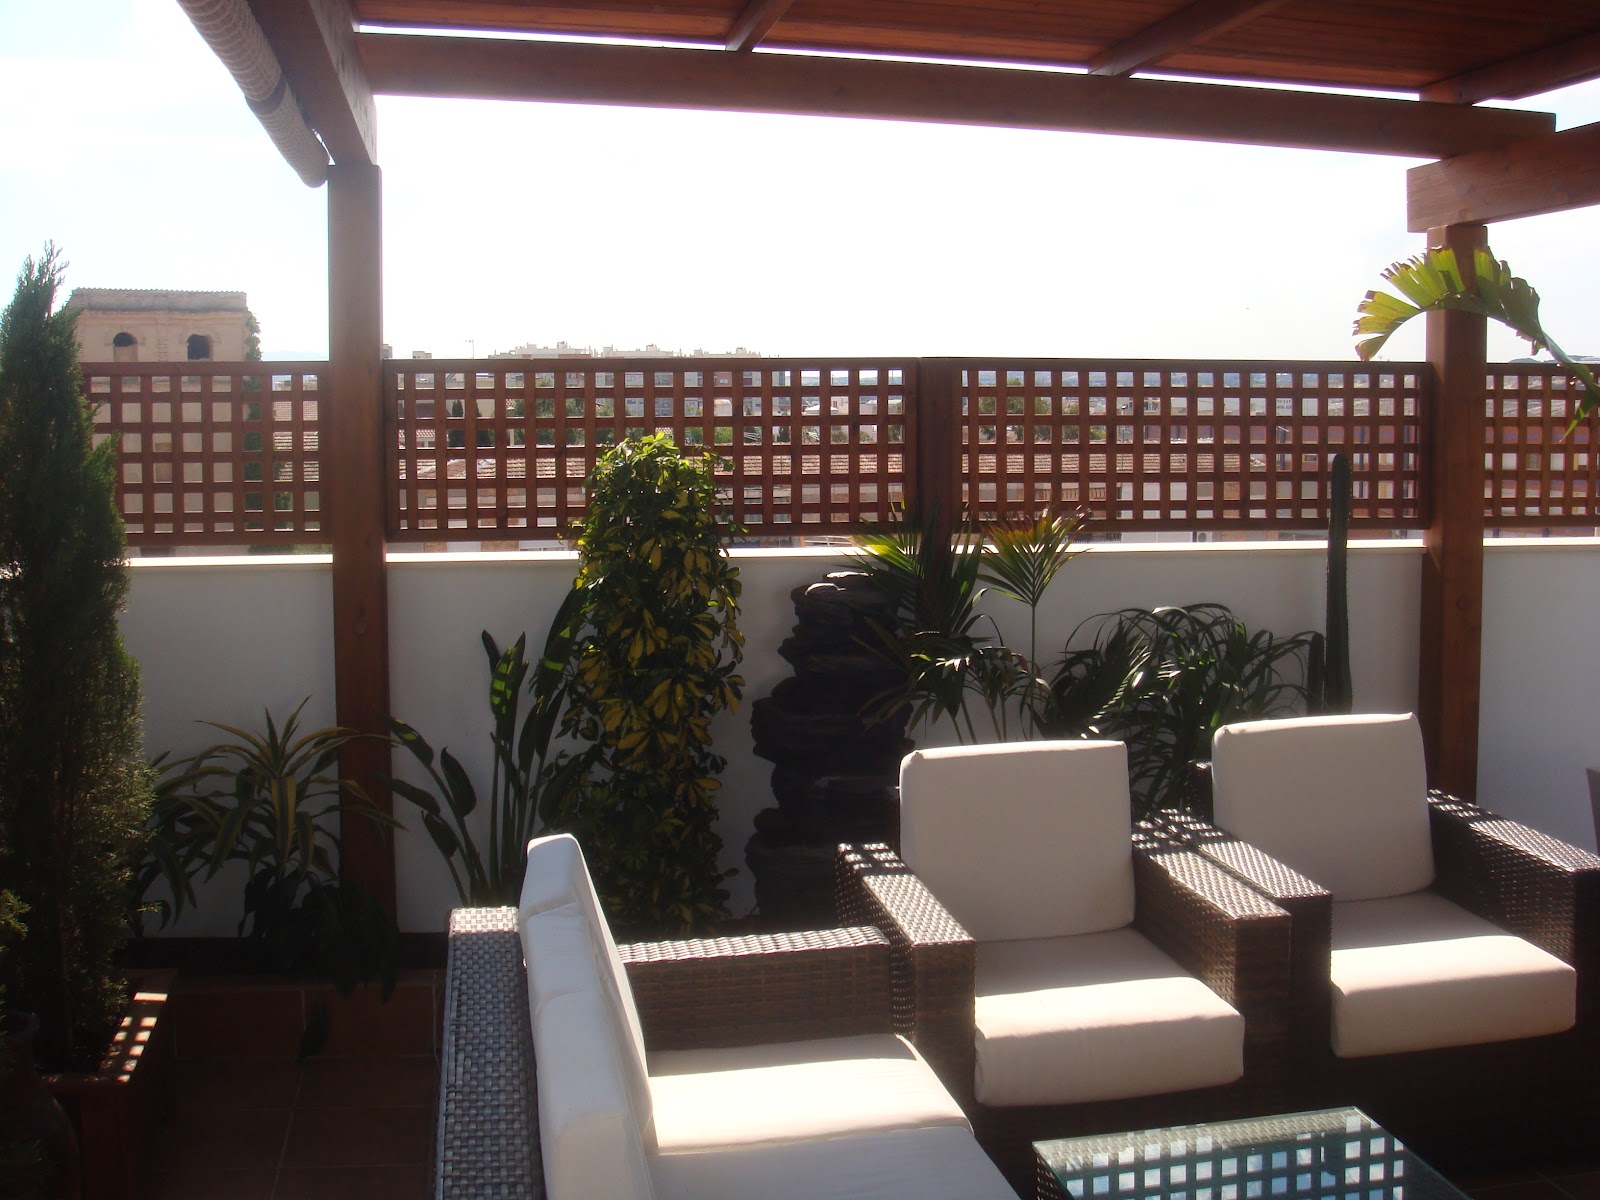 Sauco design adecuaci n de tico - Proteccion para terrazas ...